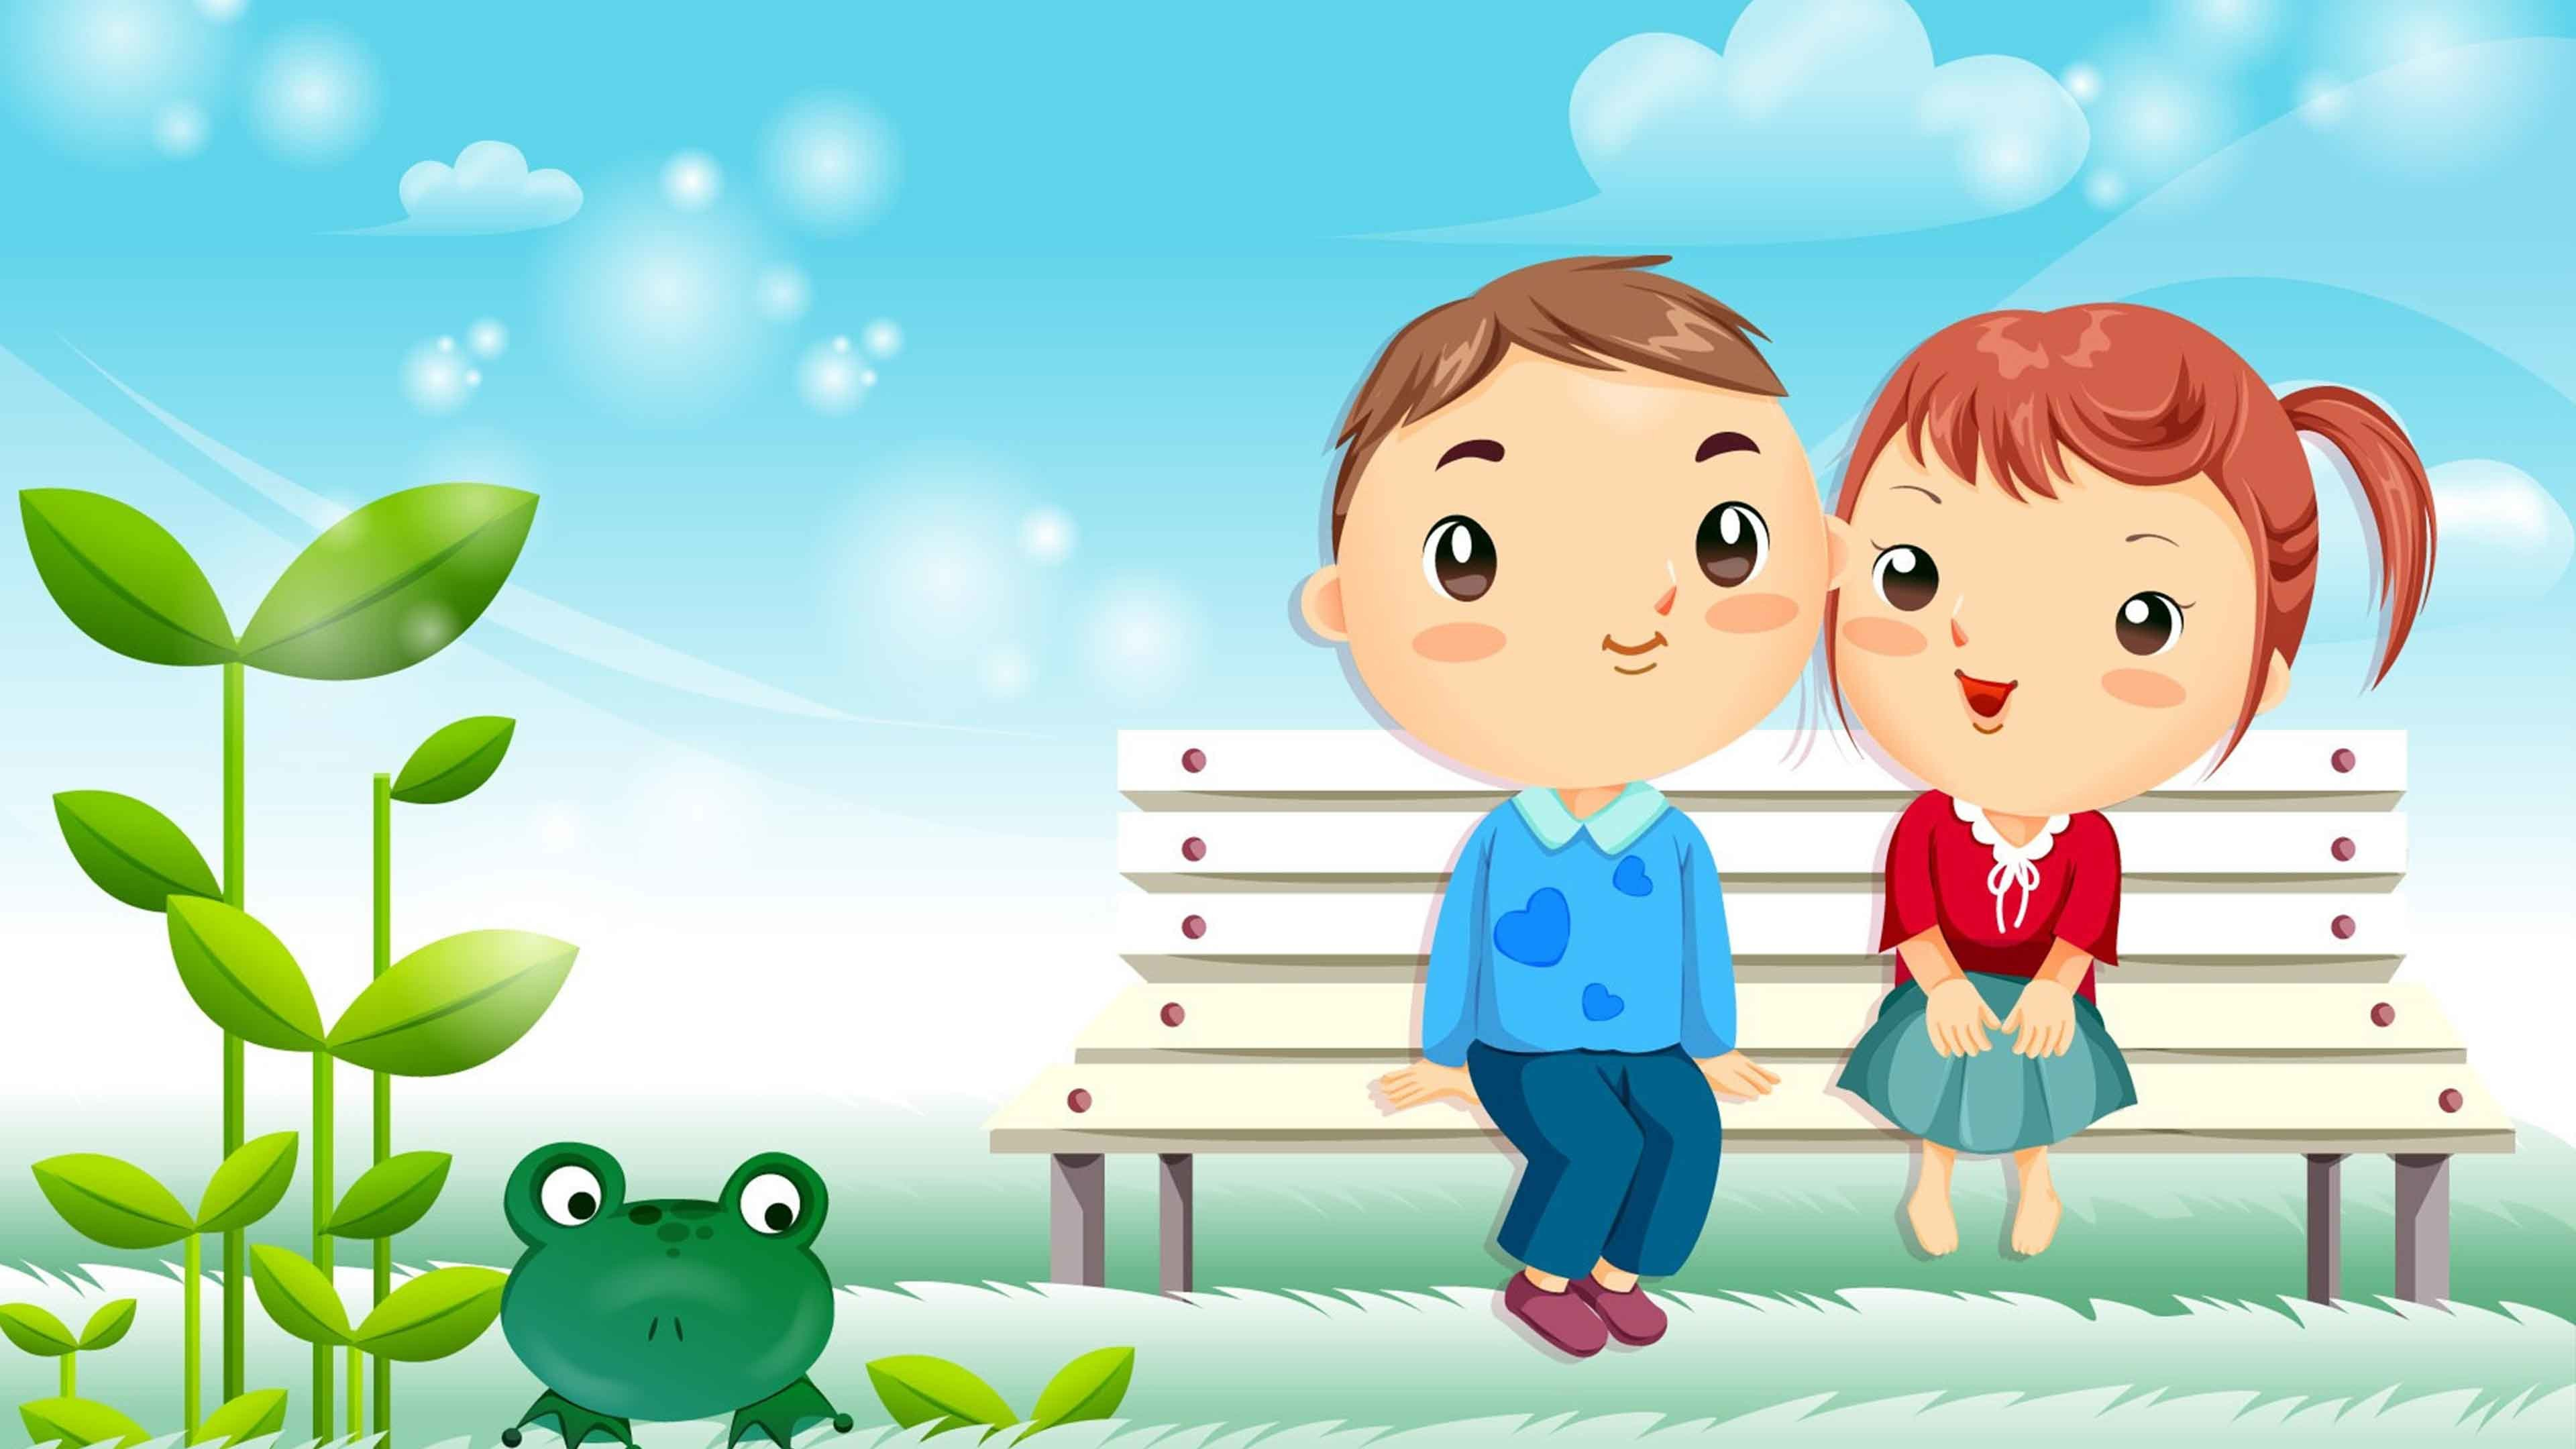 Cartoon backgrounds 54 images - Love cartoon hd ...